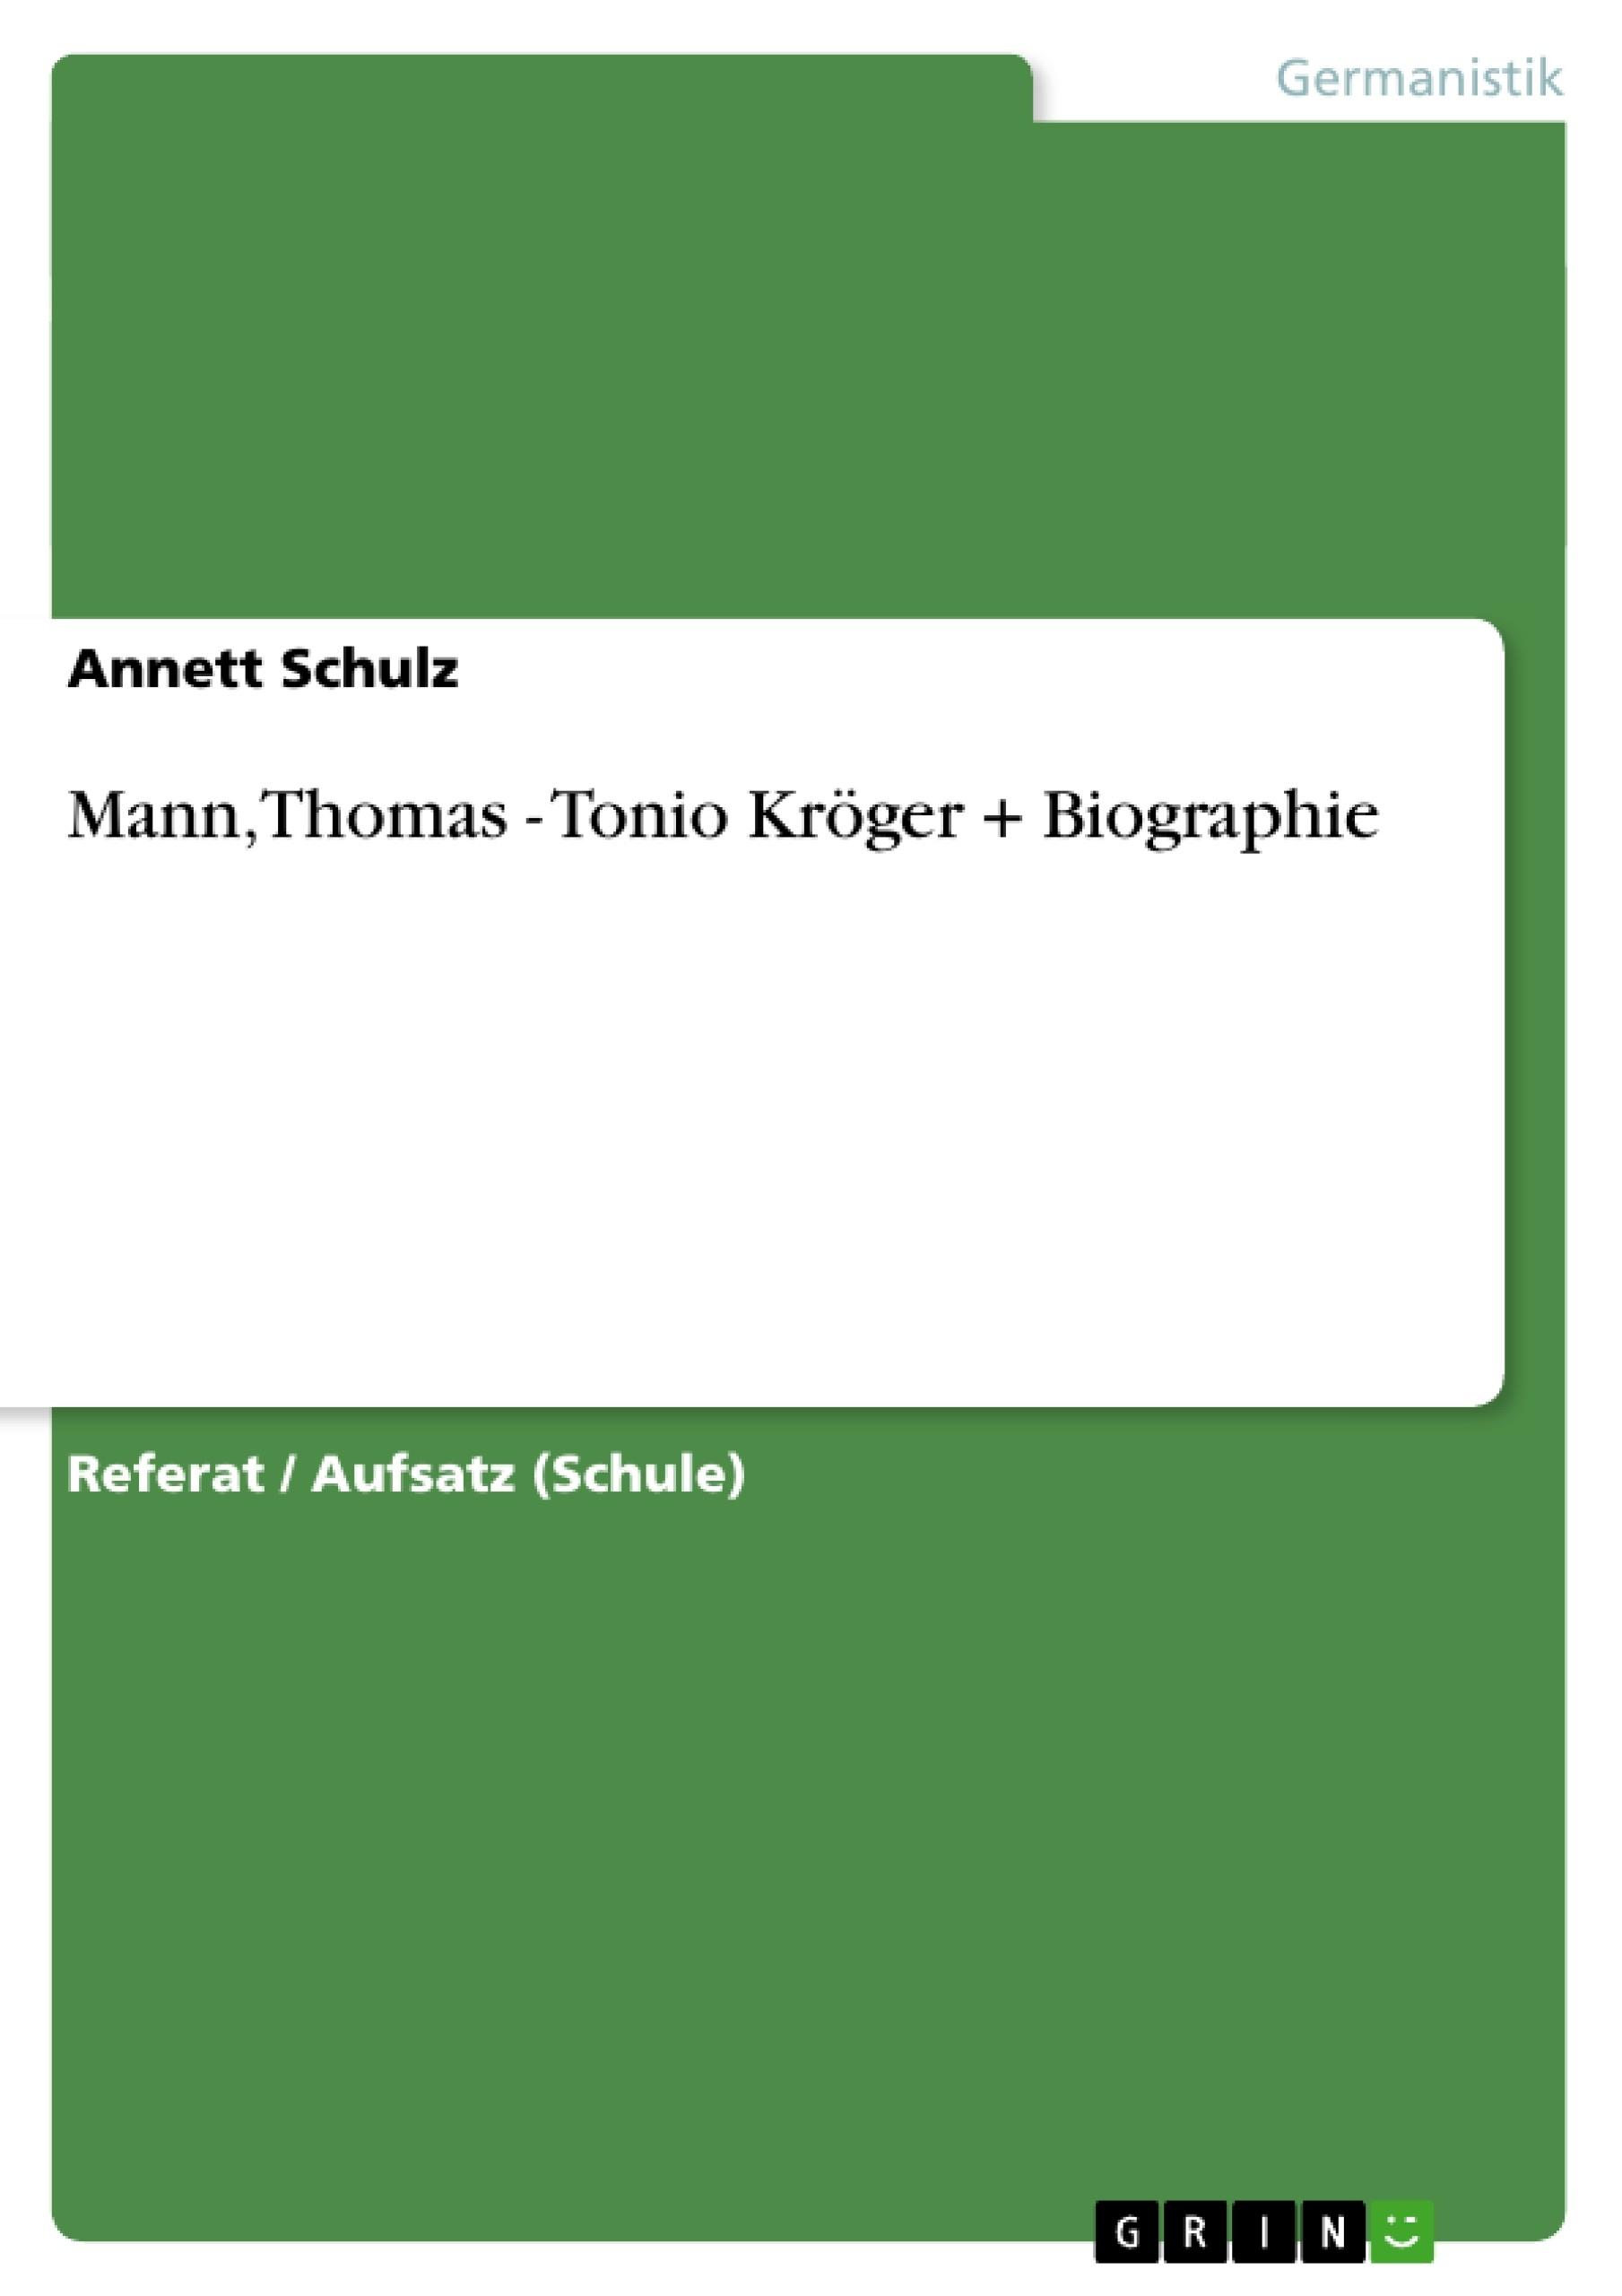 Titel: Mann, Thomas - Tonio Kröger + Biographie